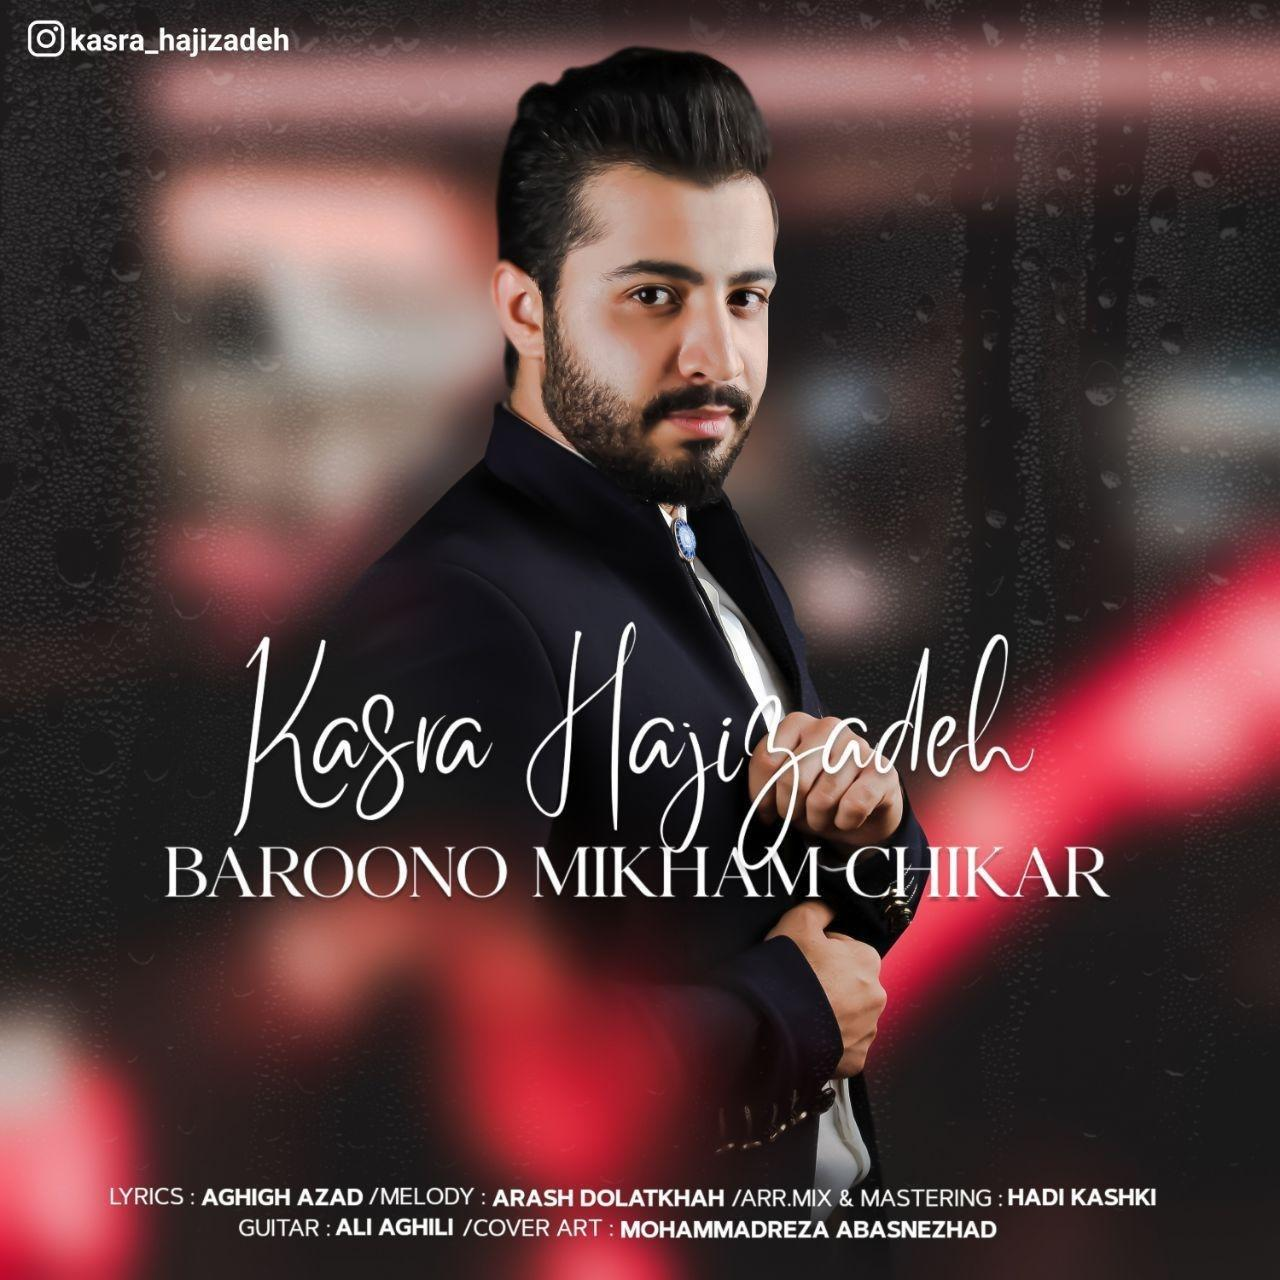 Kasra Hajizadeh – Baroono Mikham Chikar